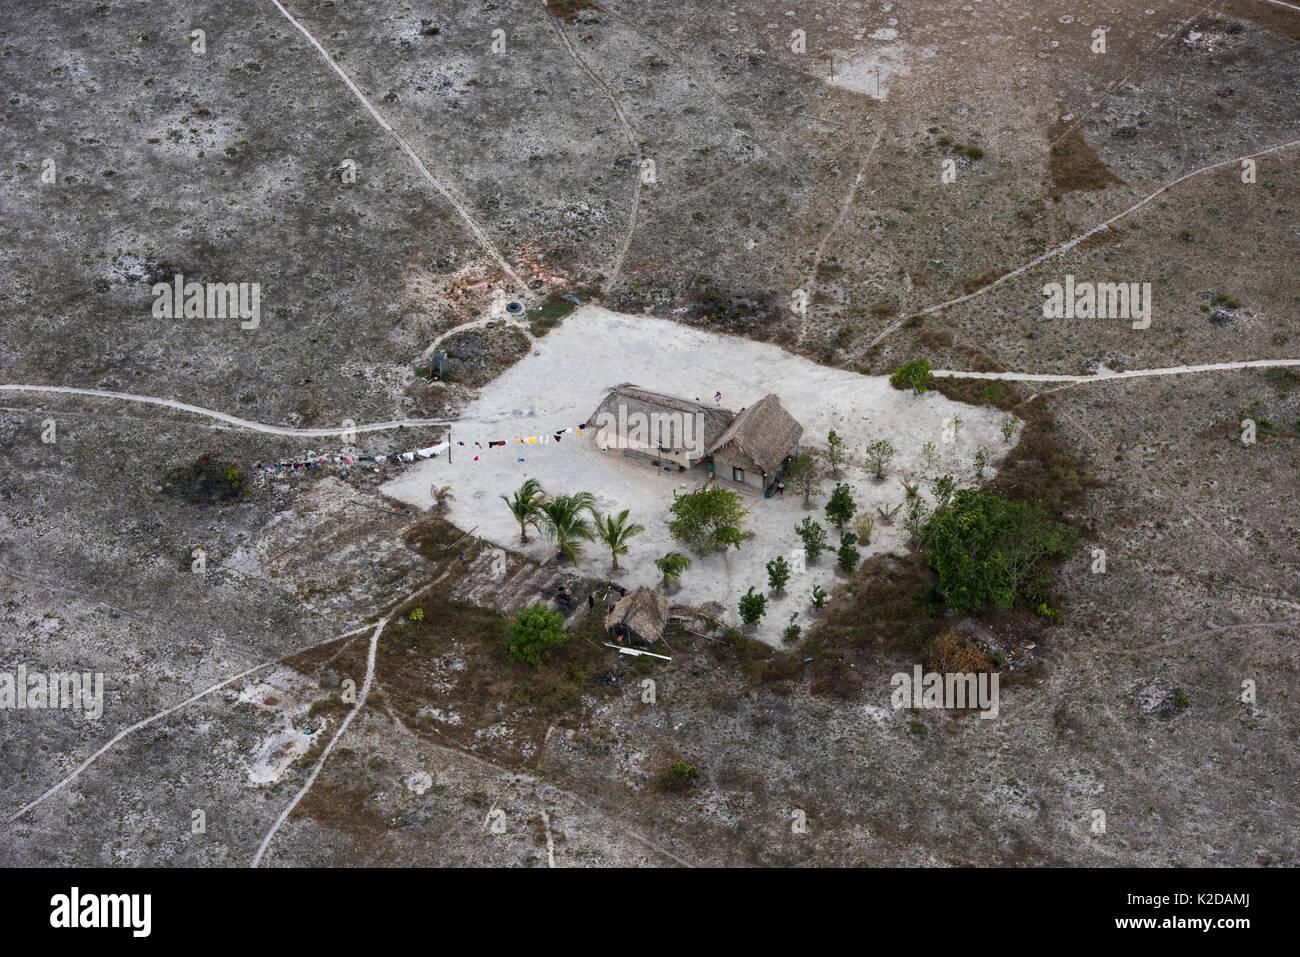 Aerial view of Amerindian House, Savanna  Rupununi, Guyana, South America - Stock Image